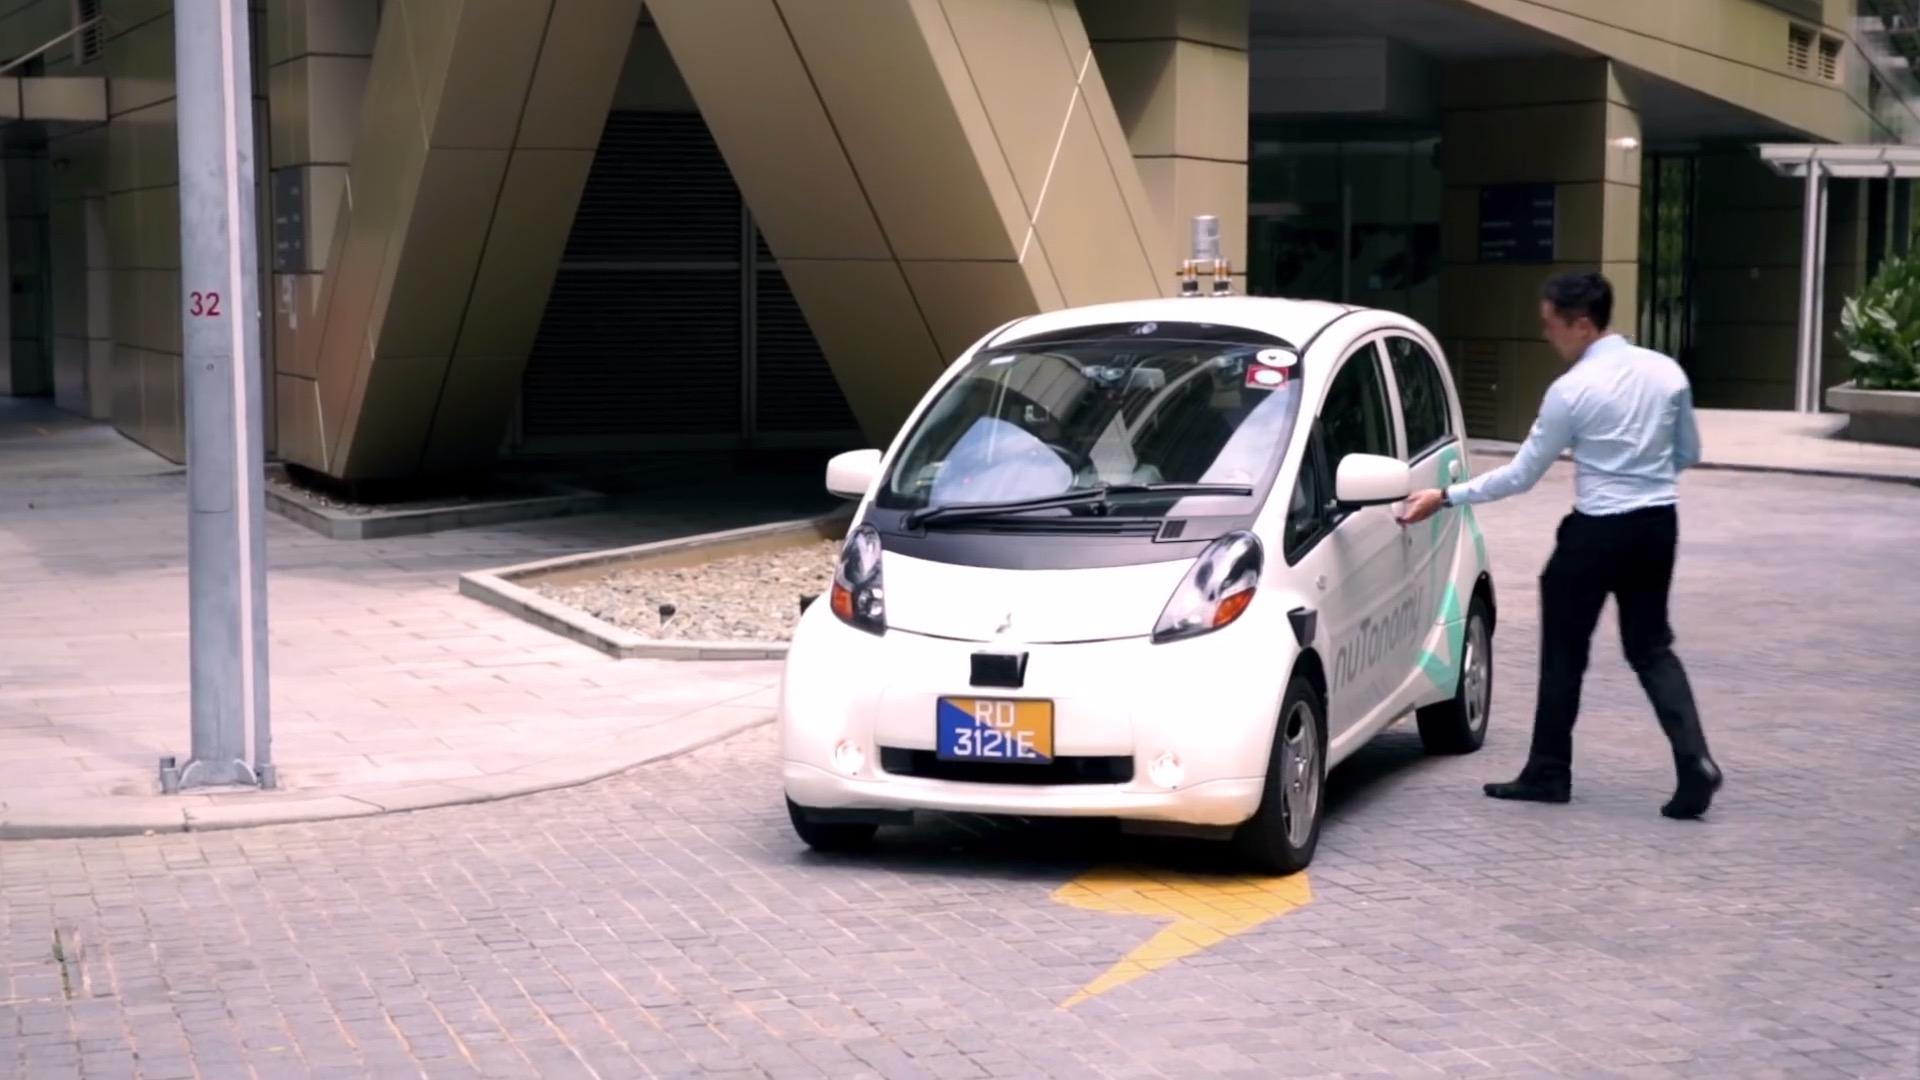 प्रथम चालकरहित टैक्सी सिंगापुर